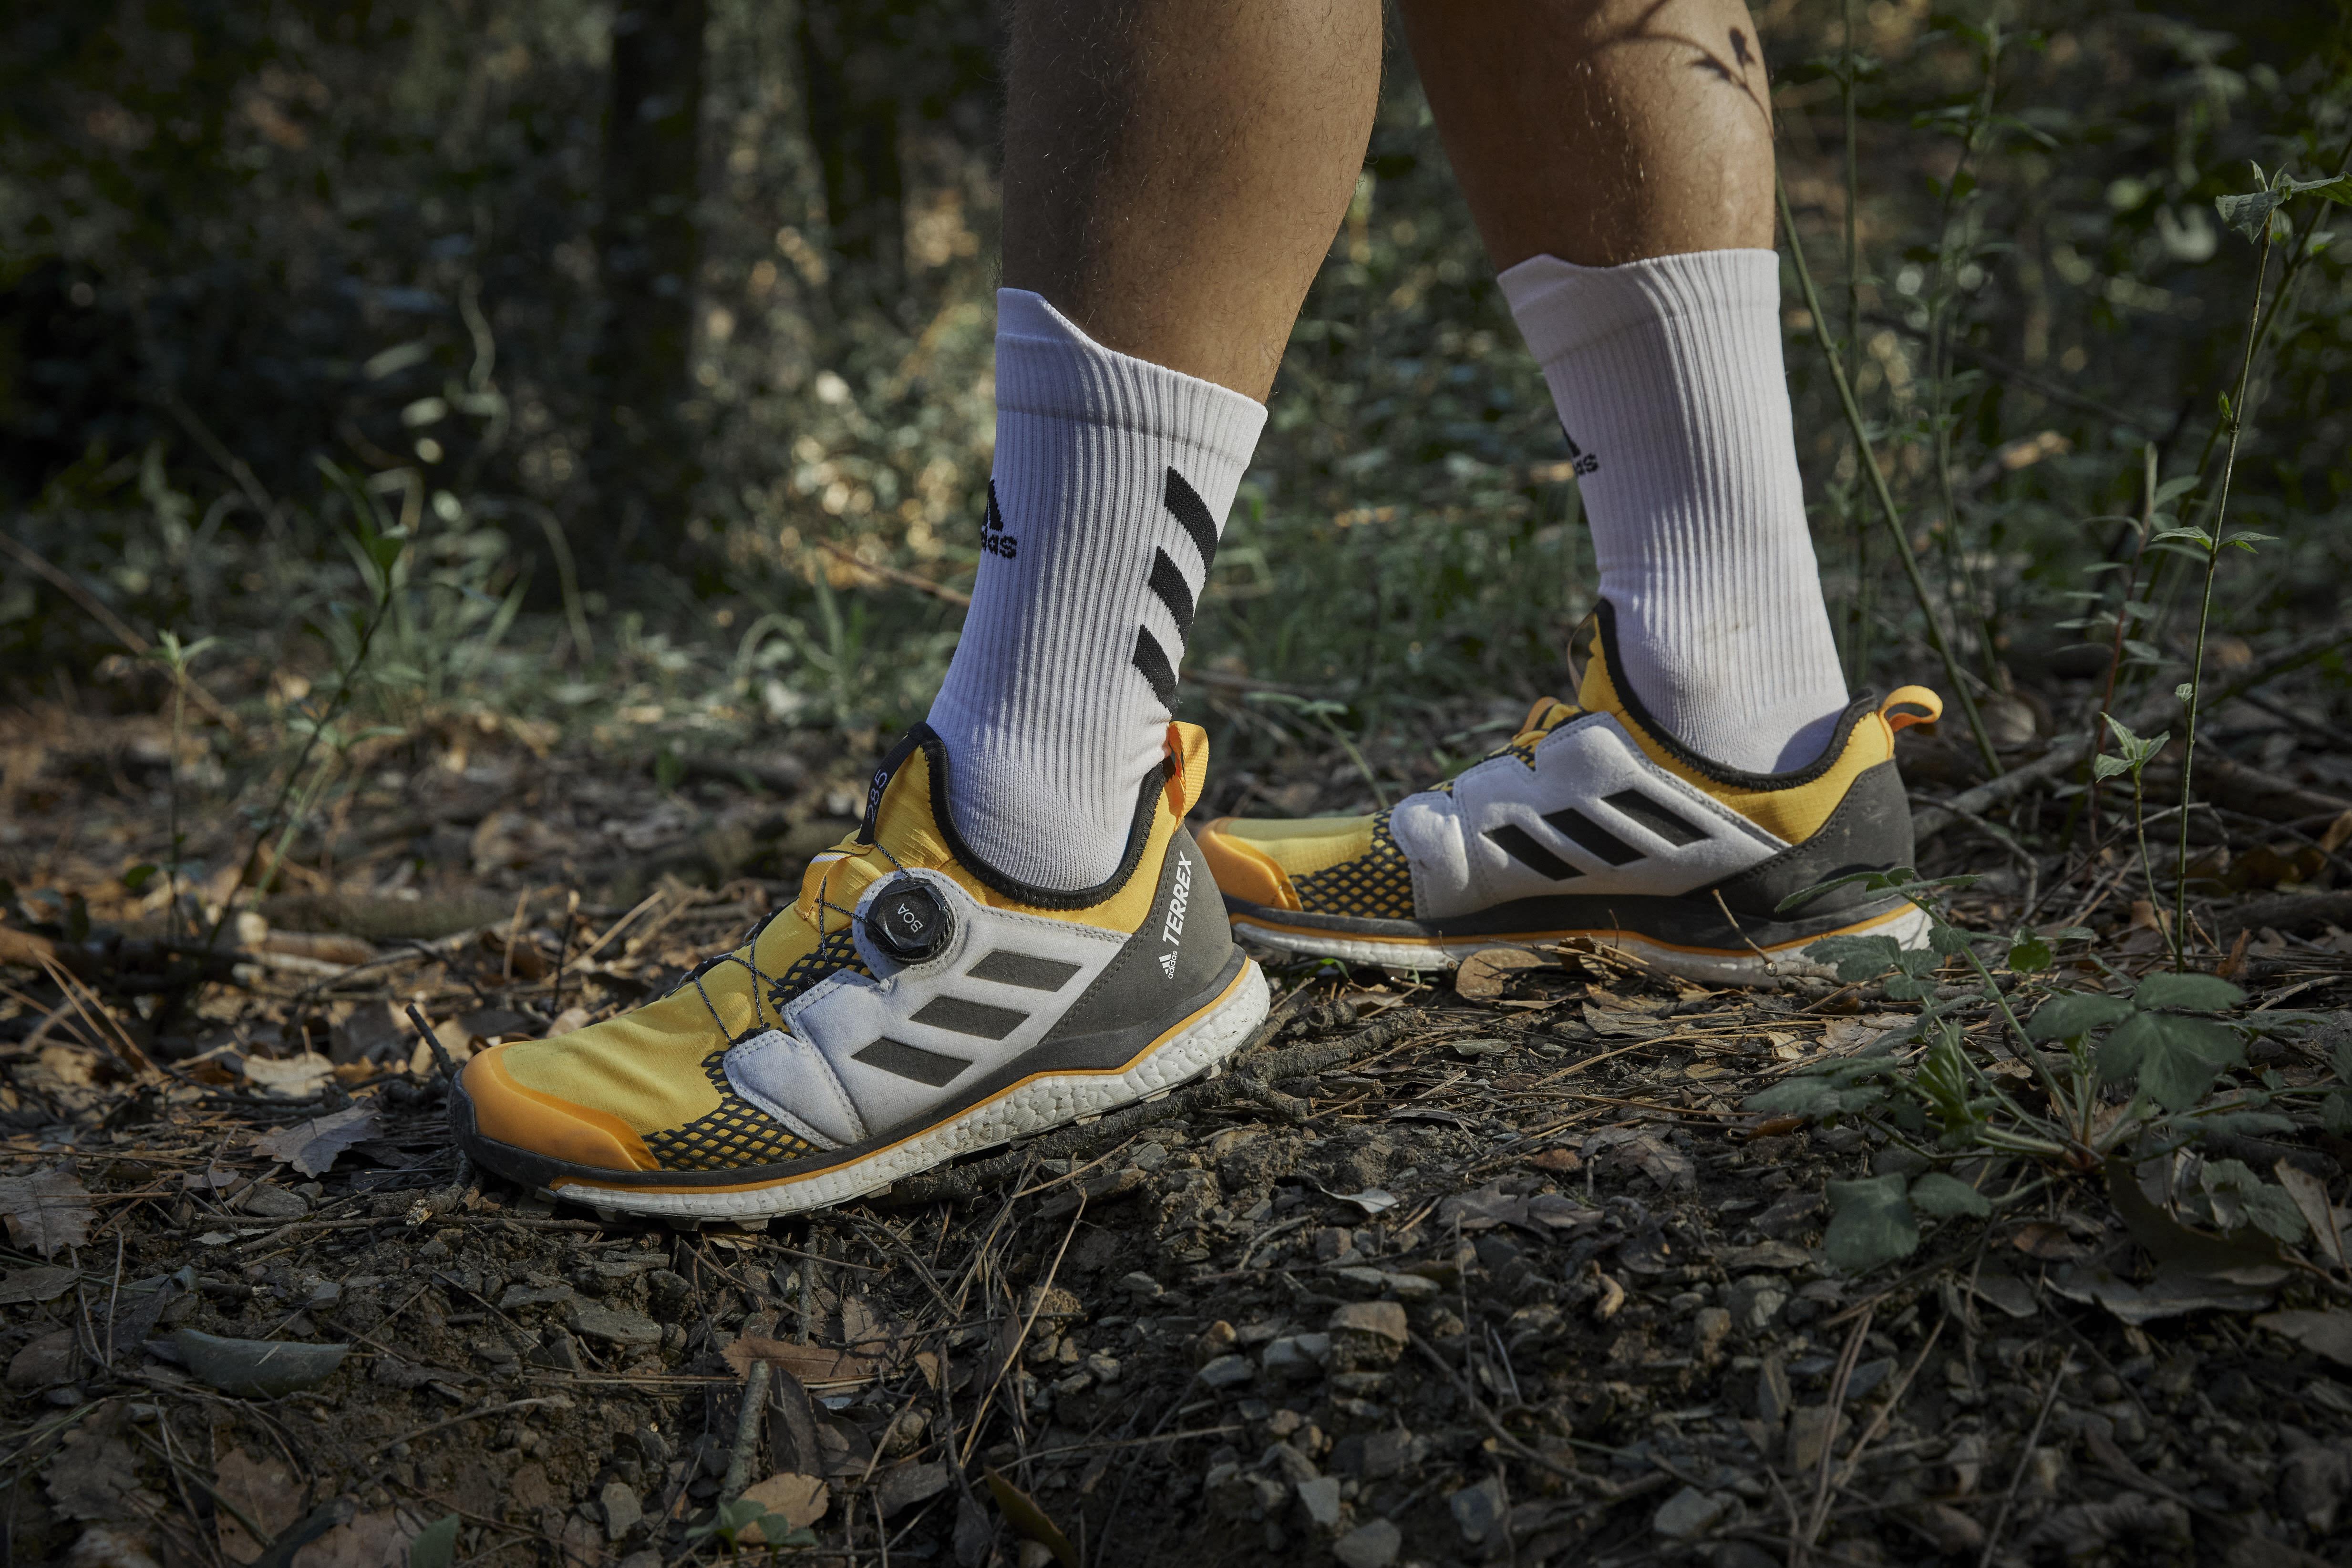 Adidas Terrex Agravic BOA 'Protohype' Lateral